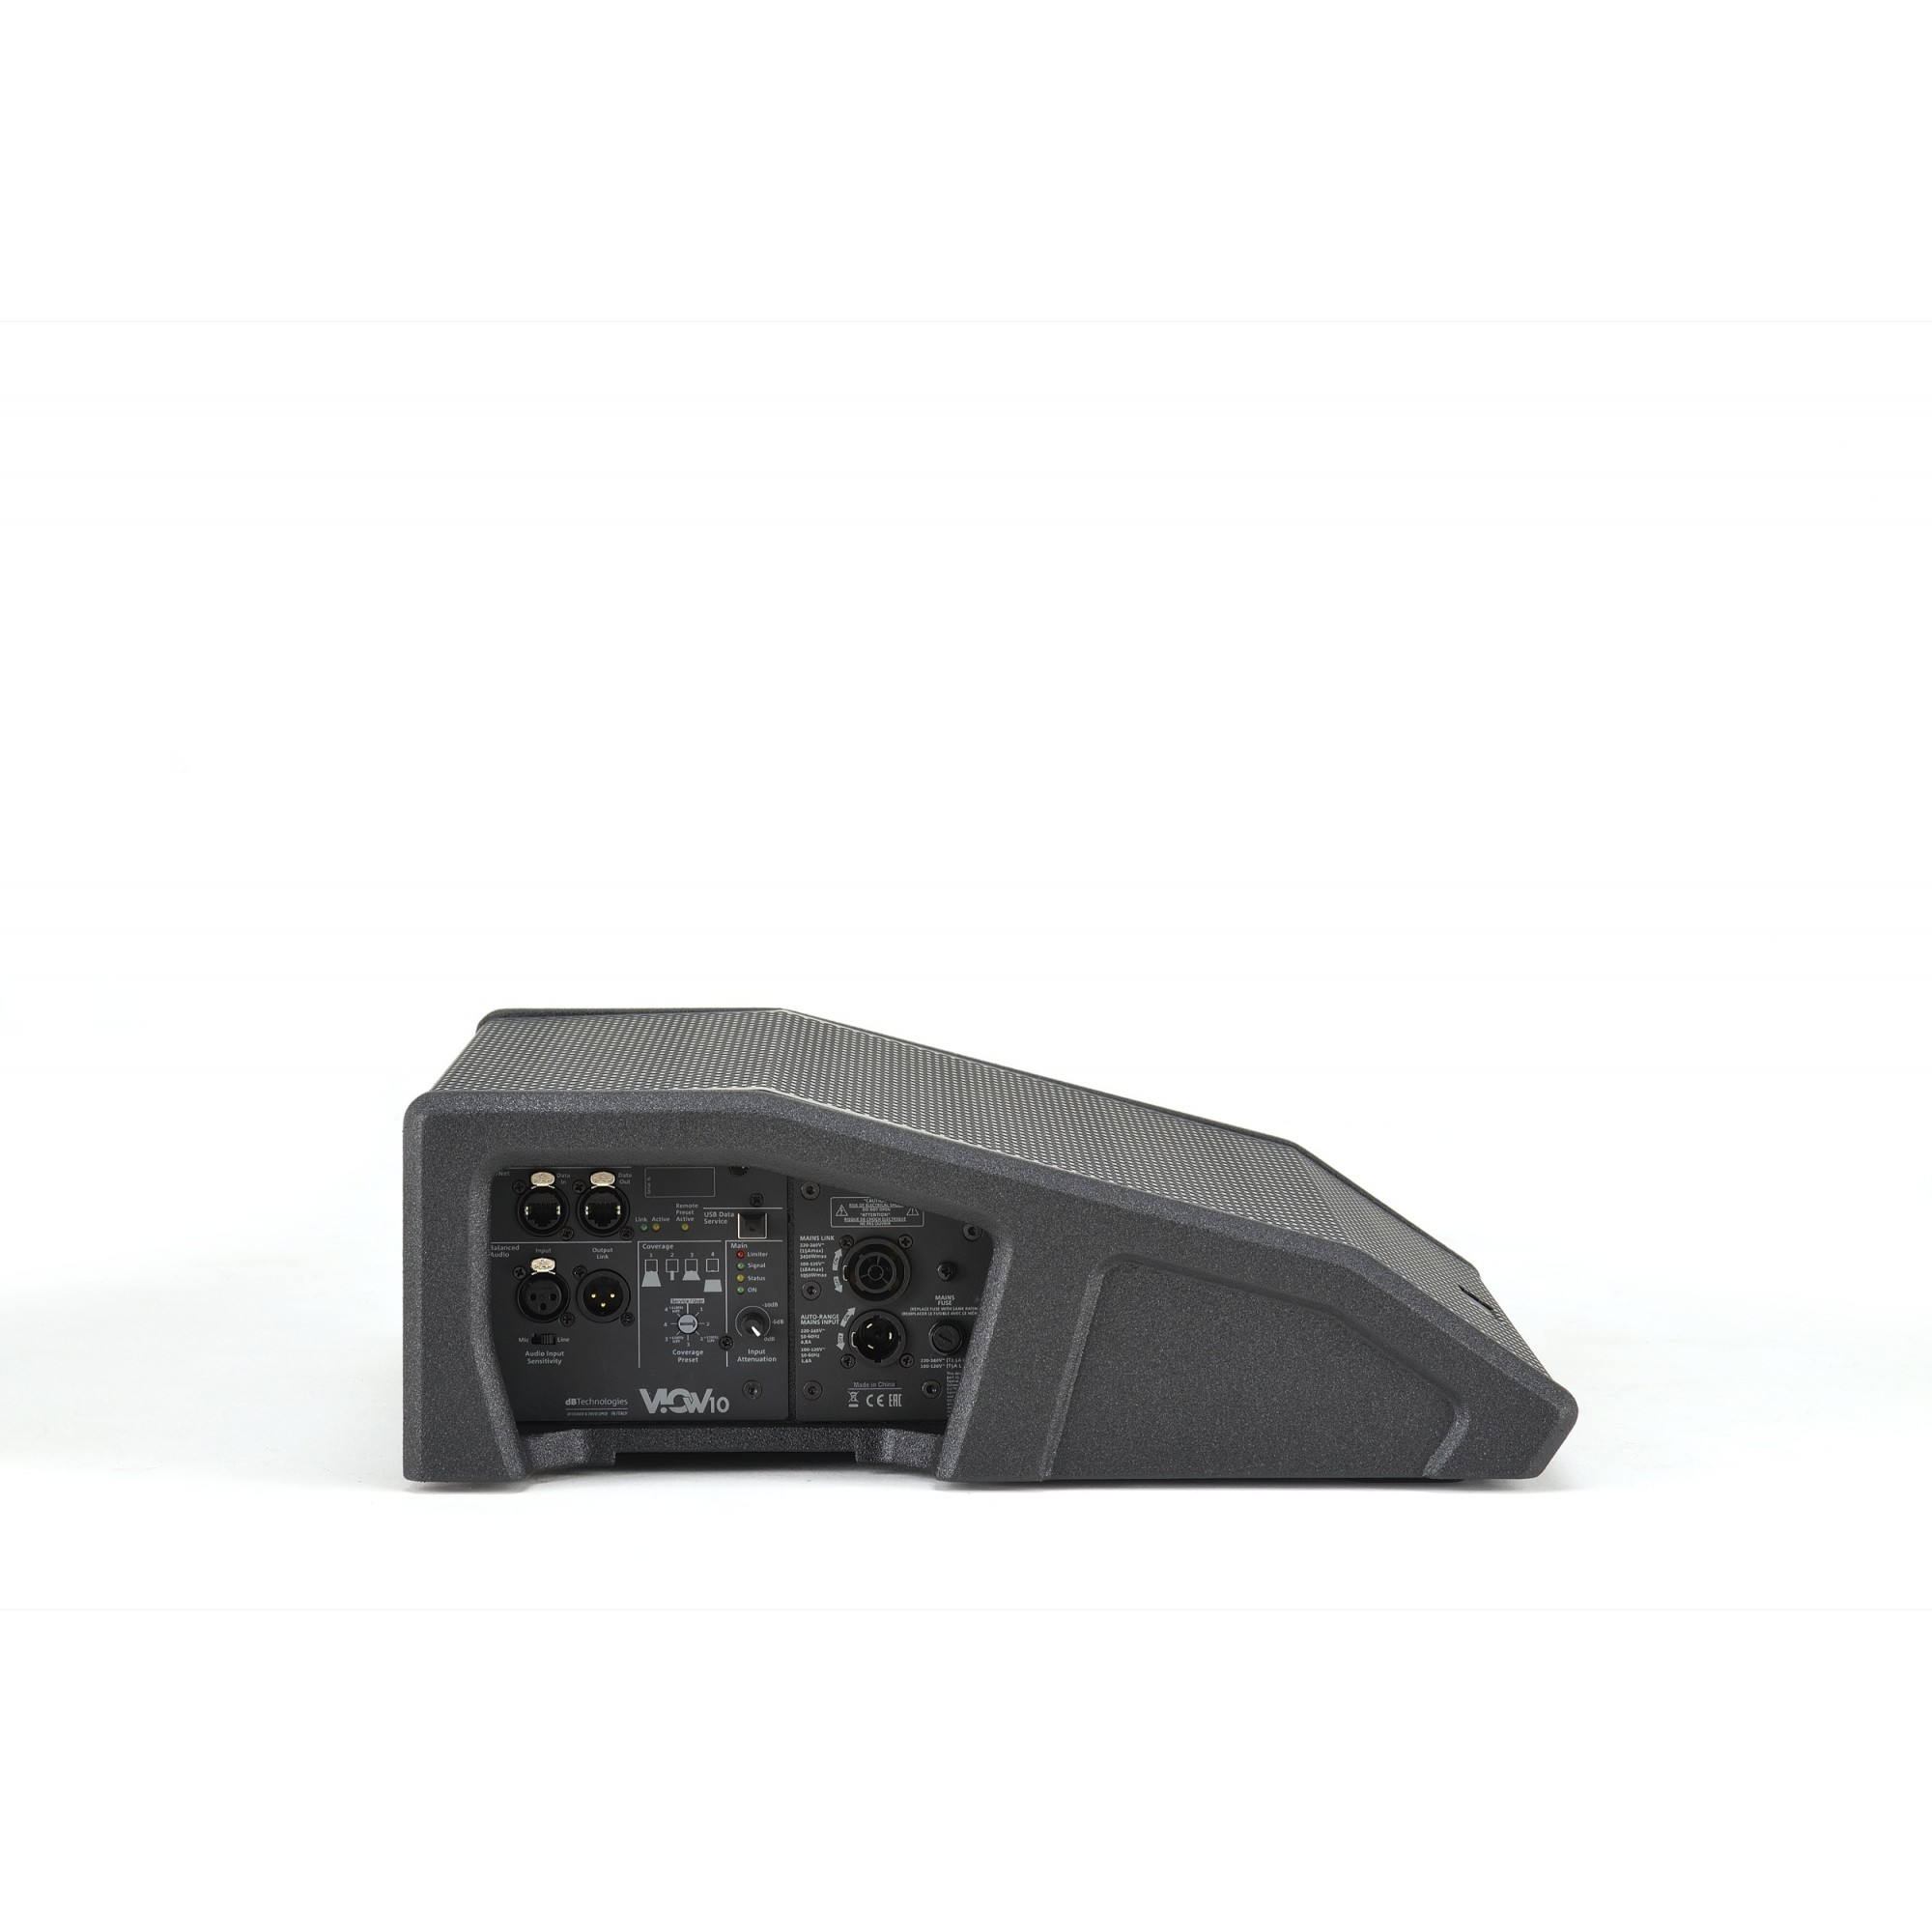 DB TECHNOLOGIES VIO W10